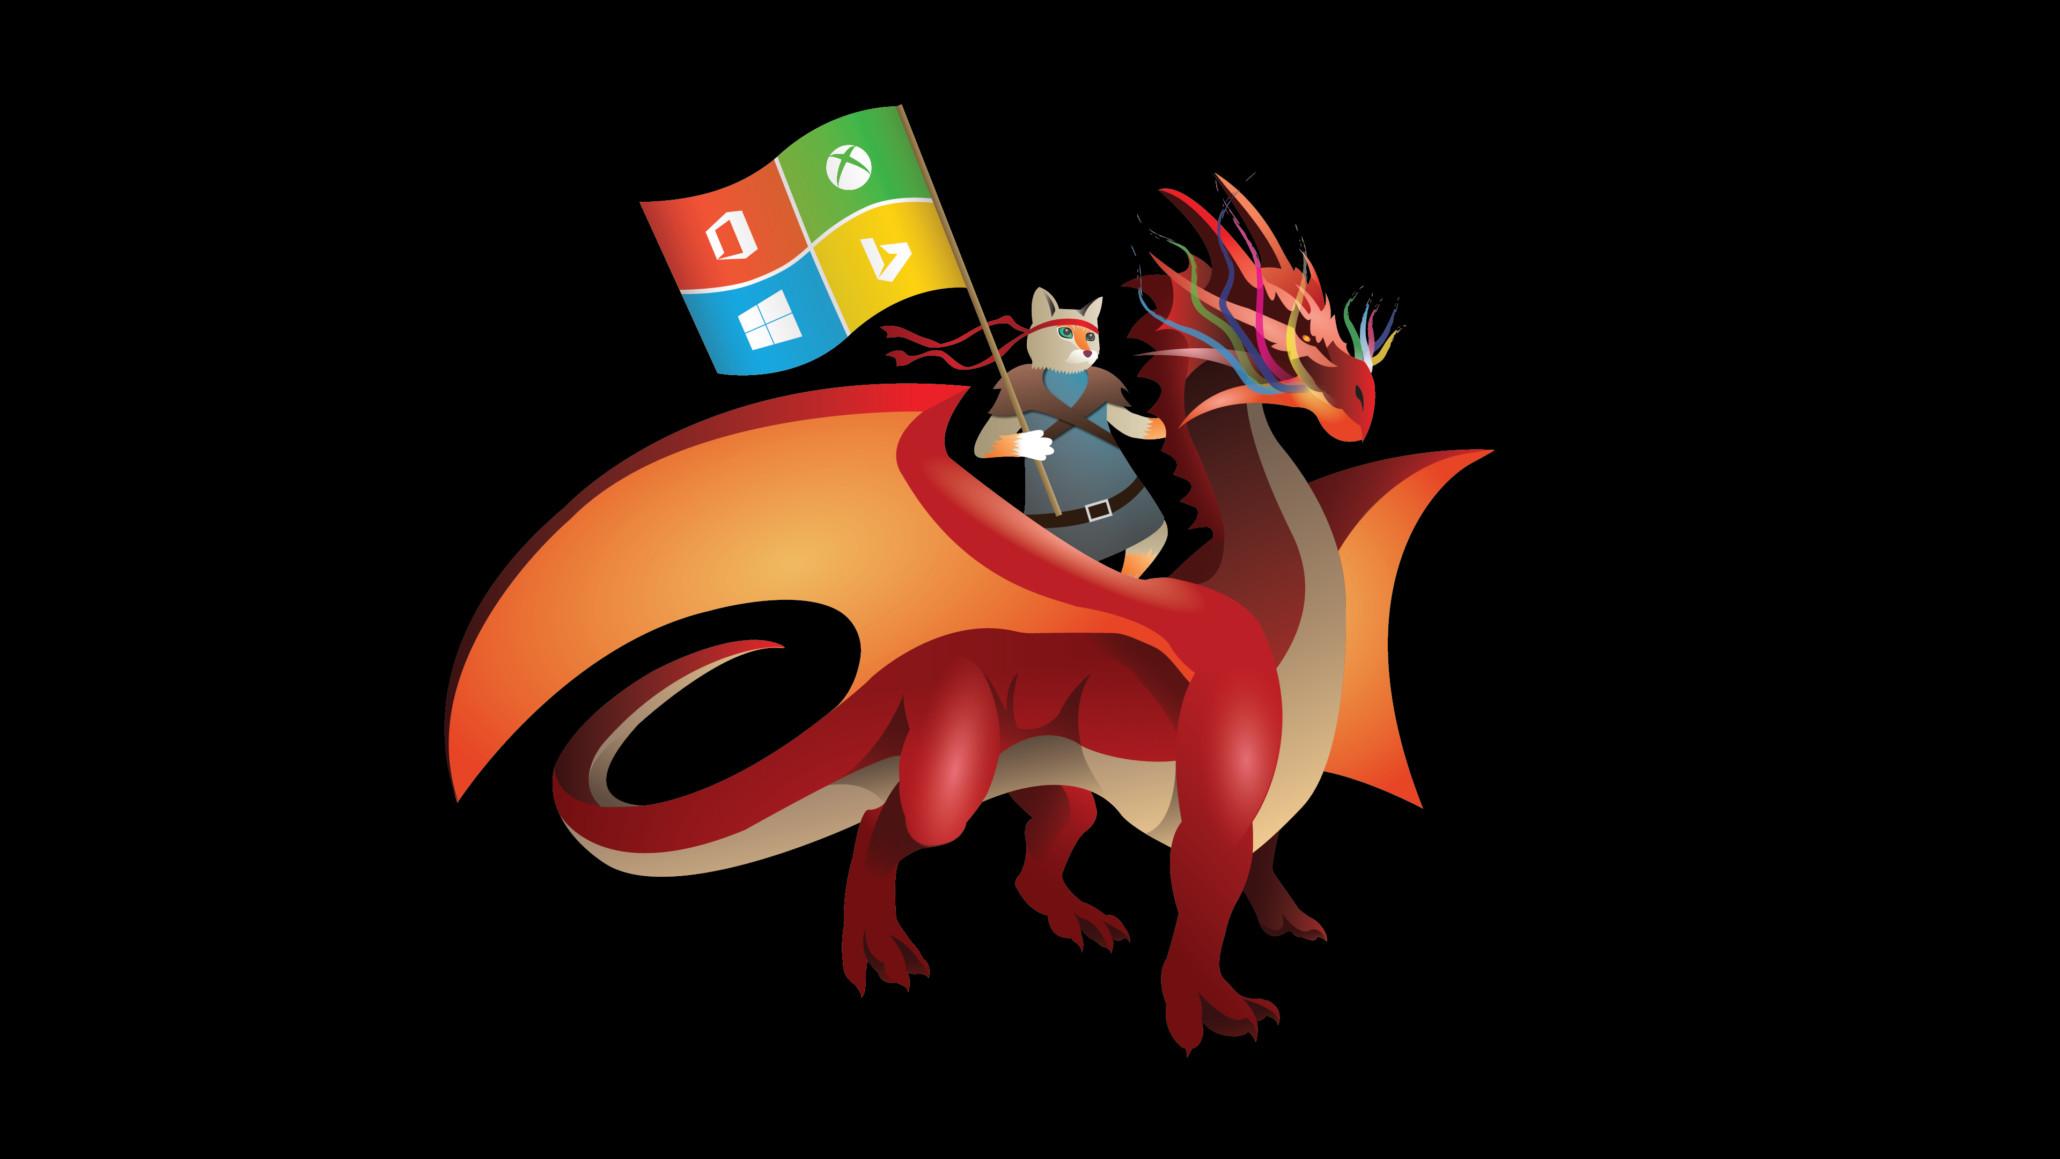 Res: 2060x1159, windows 10 Fall Creators Update ninjacat wallpaper